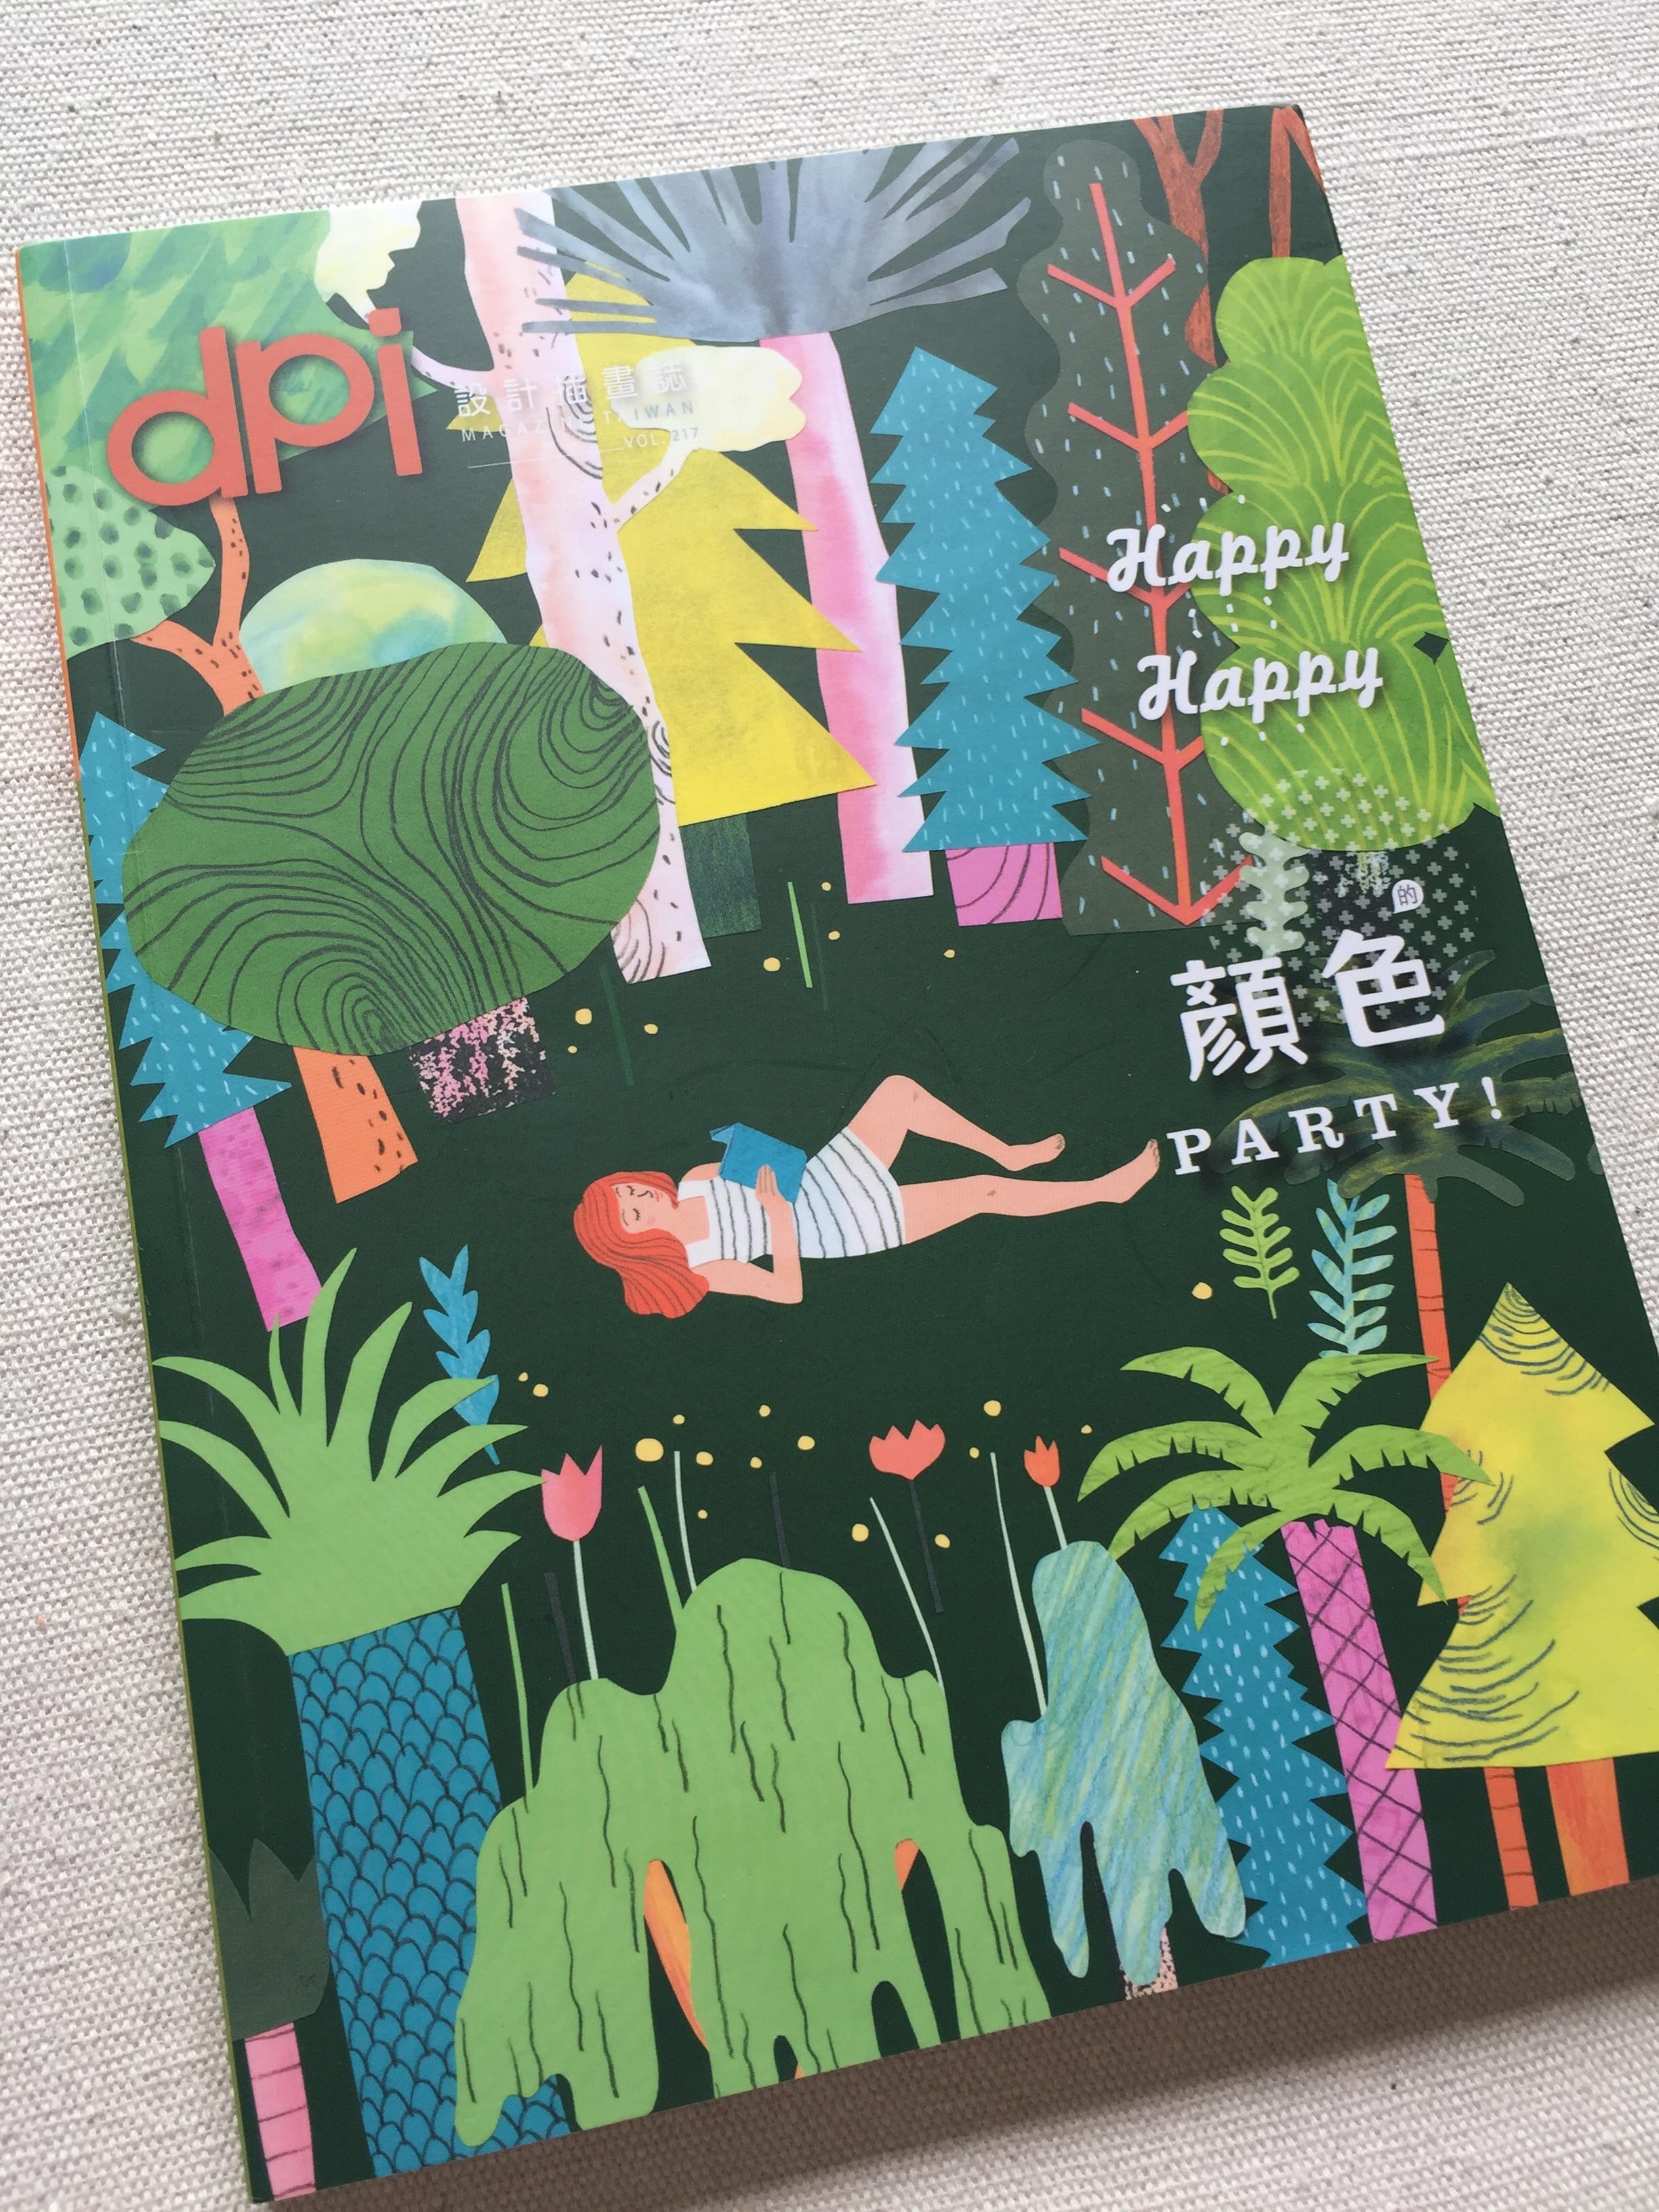 Shell Rummel DPI magazine